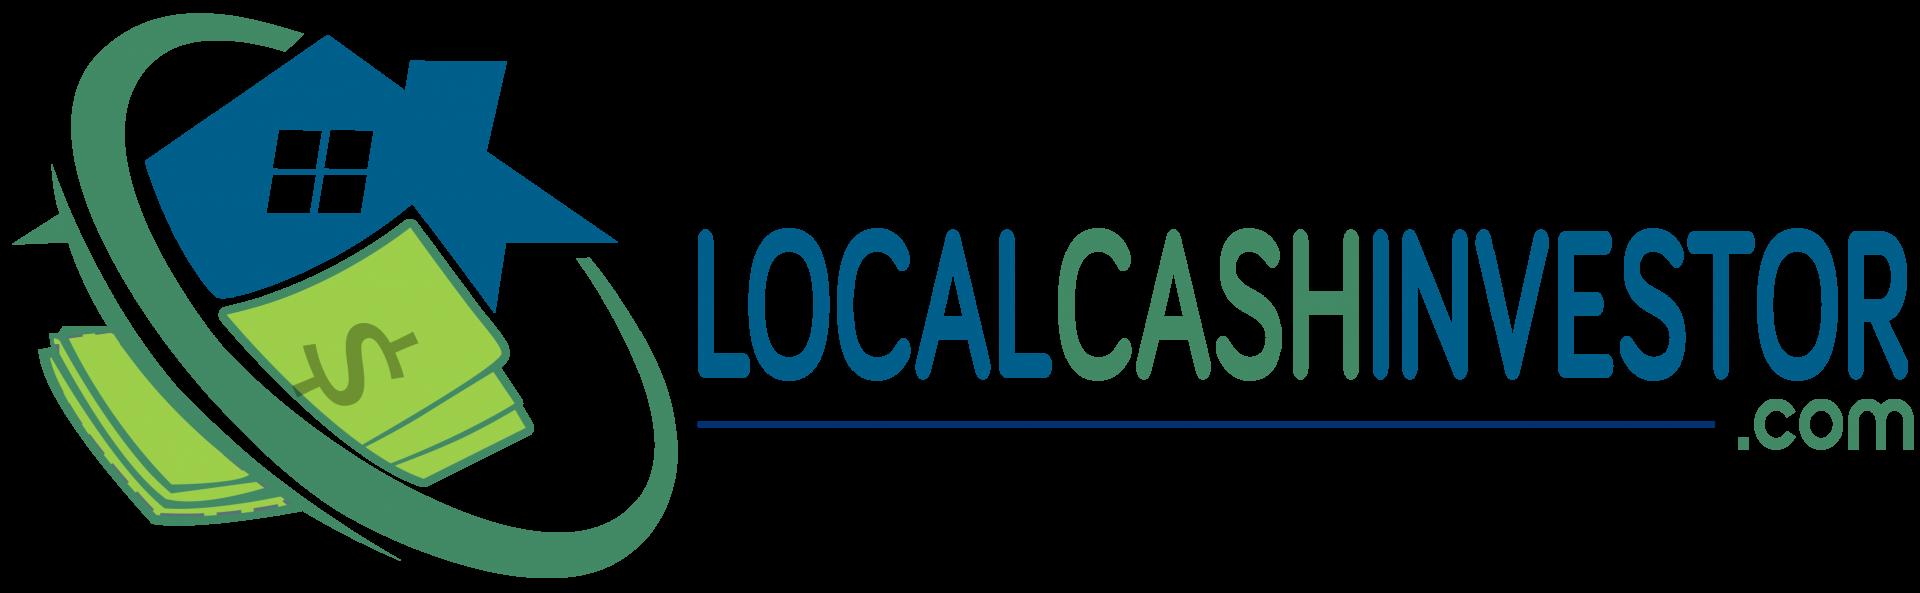 LocalCashInvestor  logo